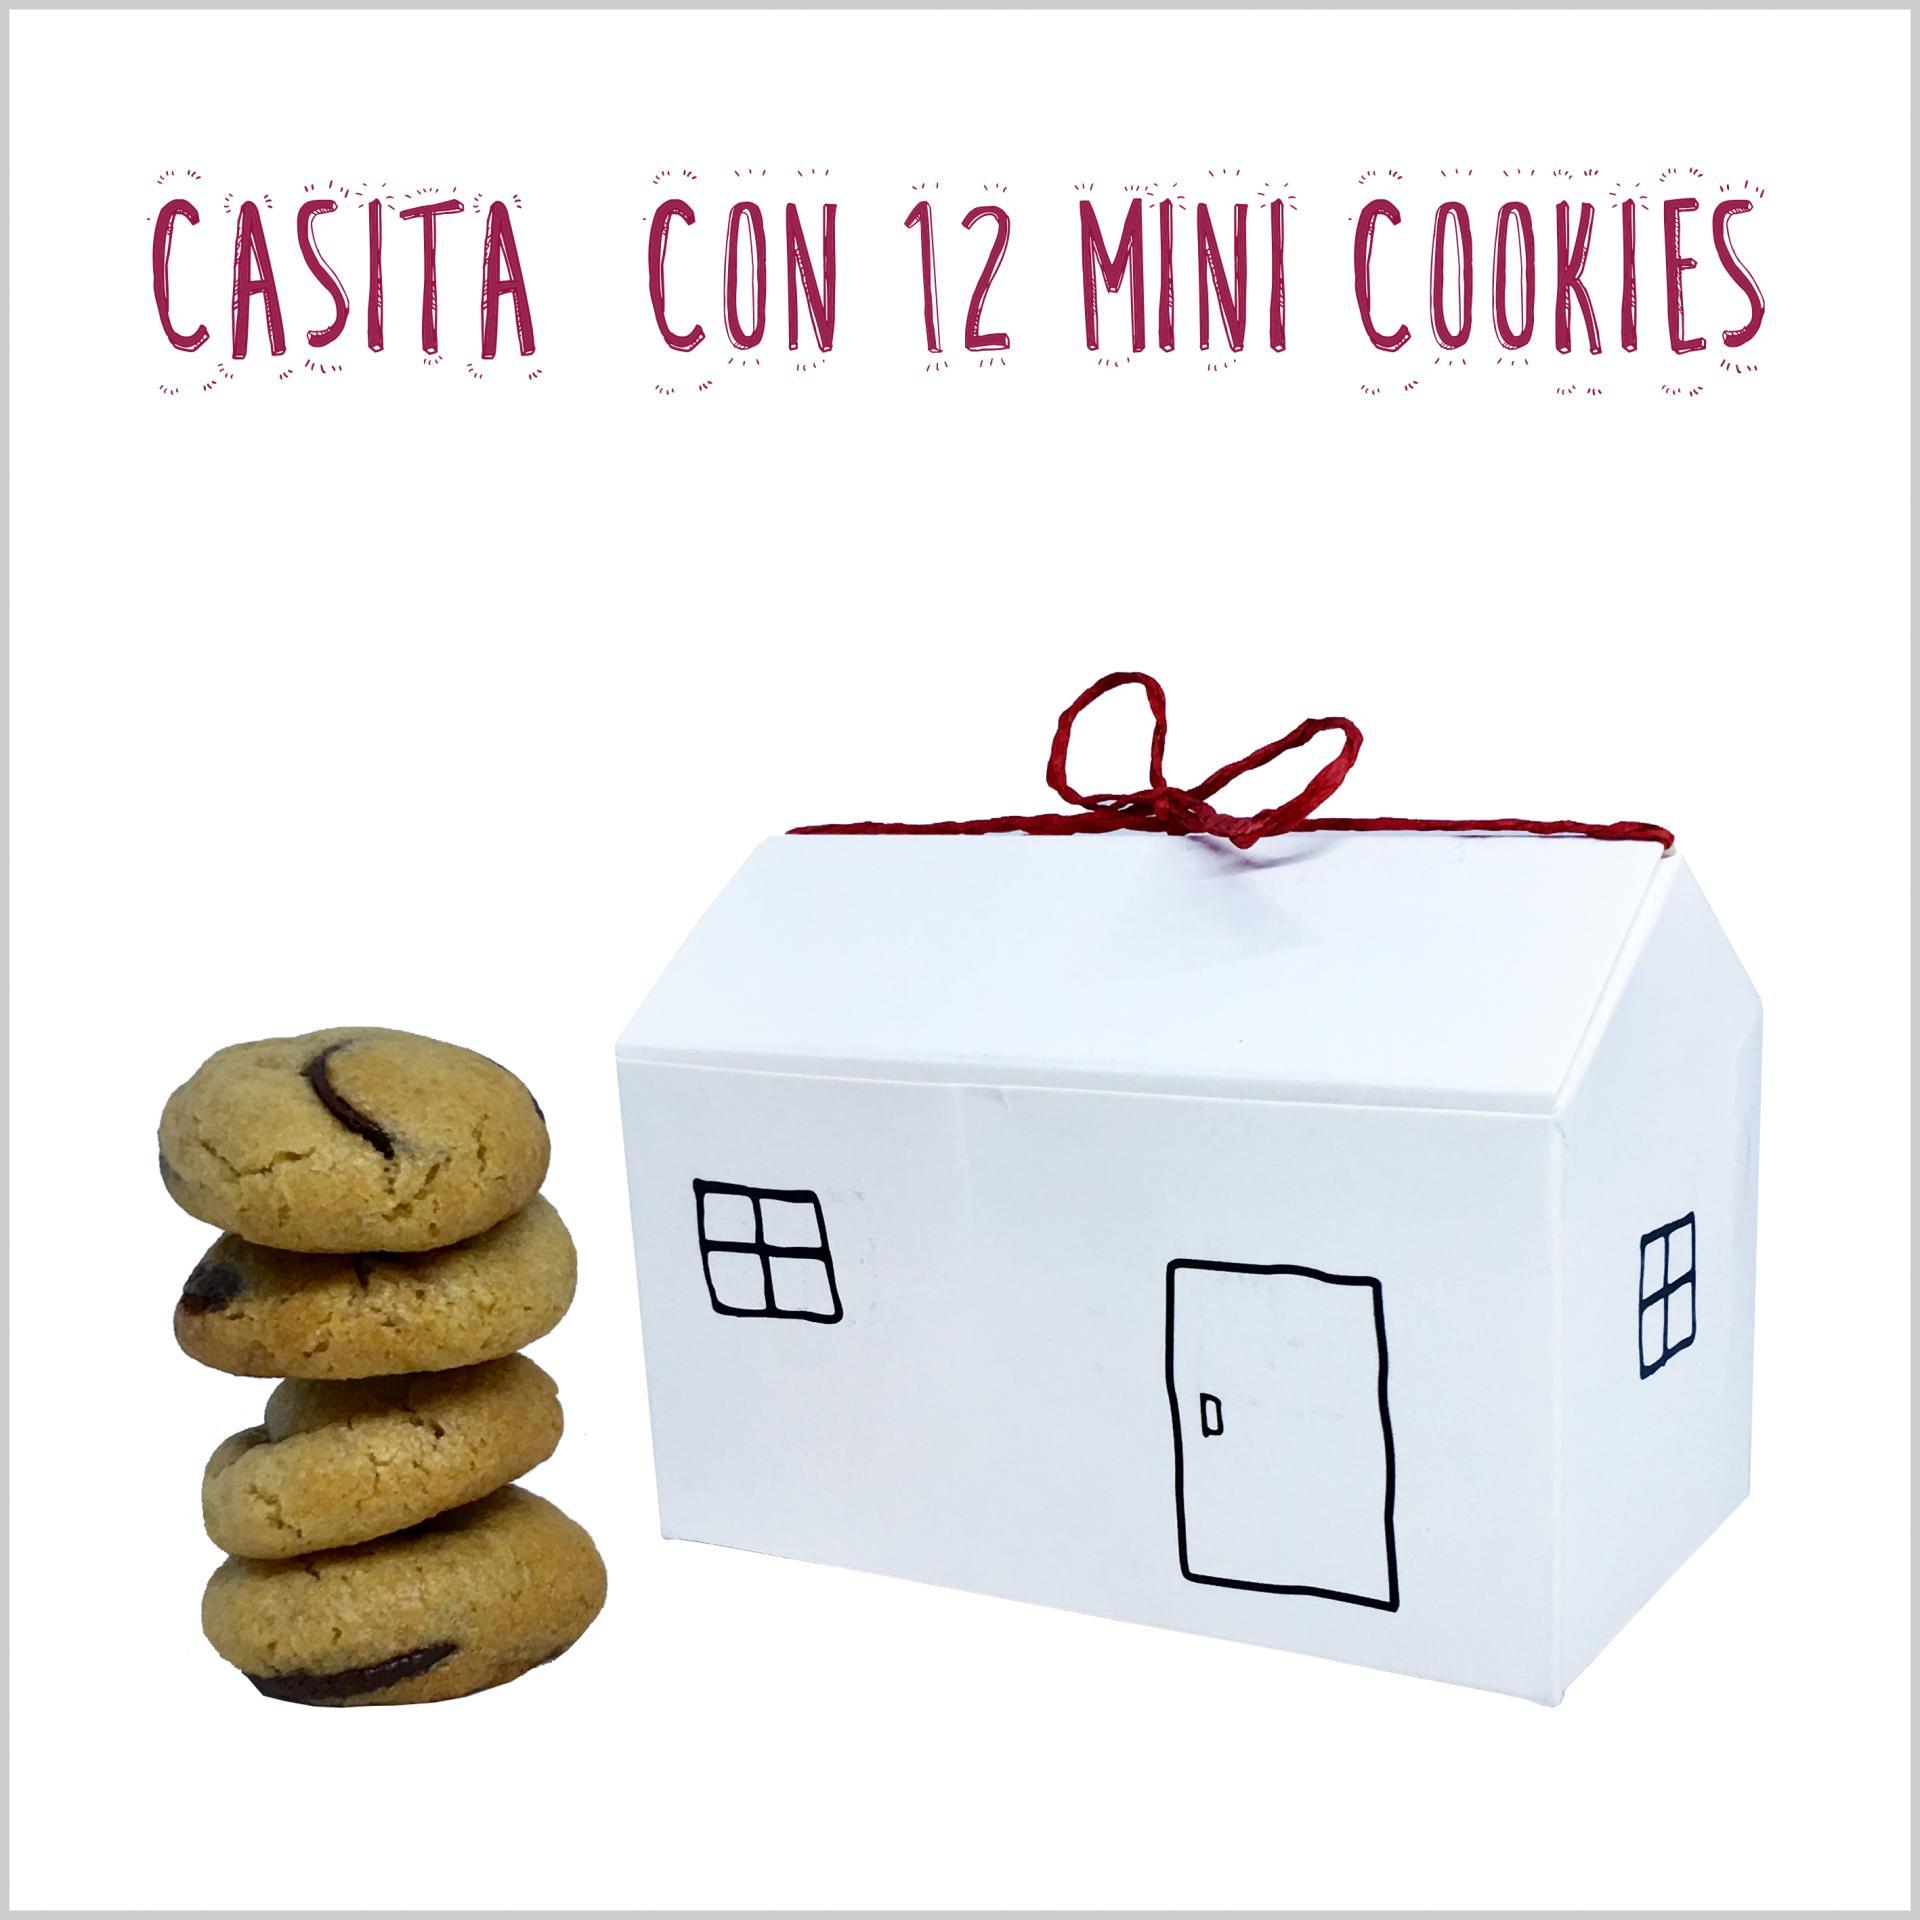 Casita con 12 mini cookies